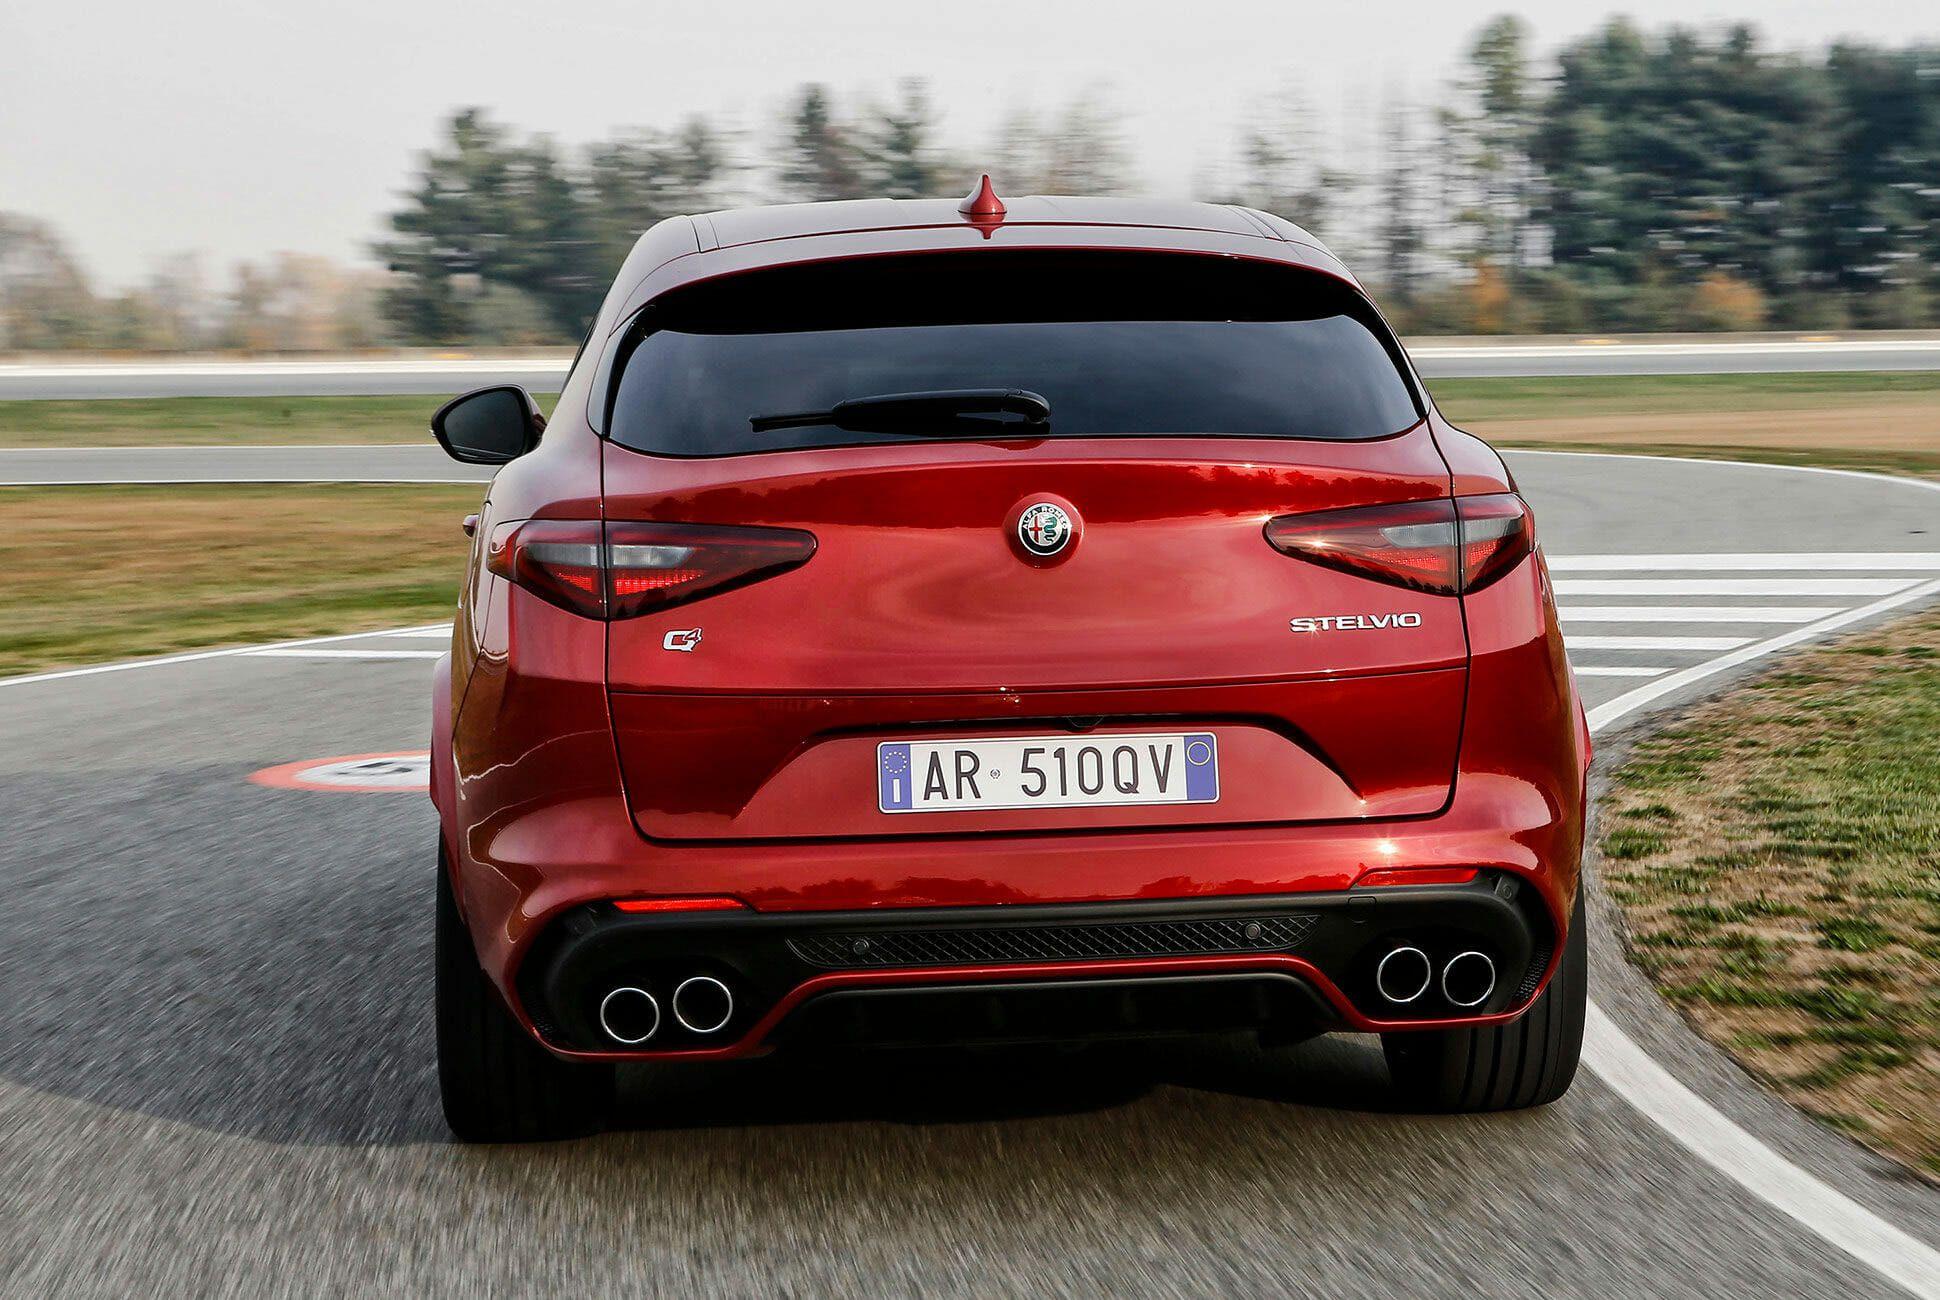 Alfa-Romeo-Quadrifoglio-Stelvia-and-Giulia-gear-patrol-slide-9